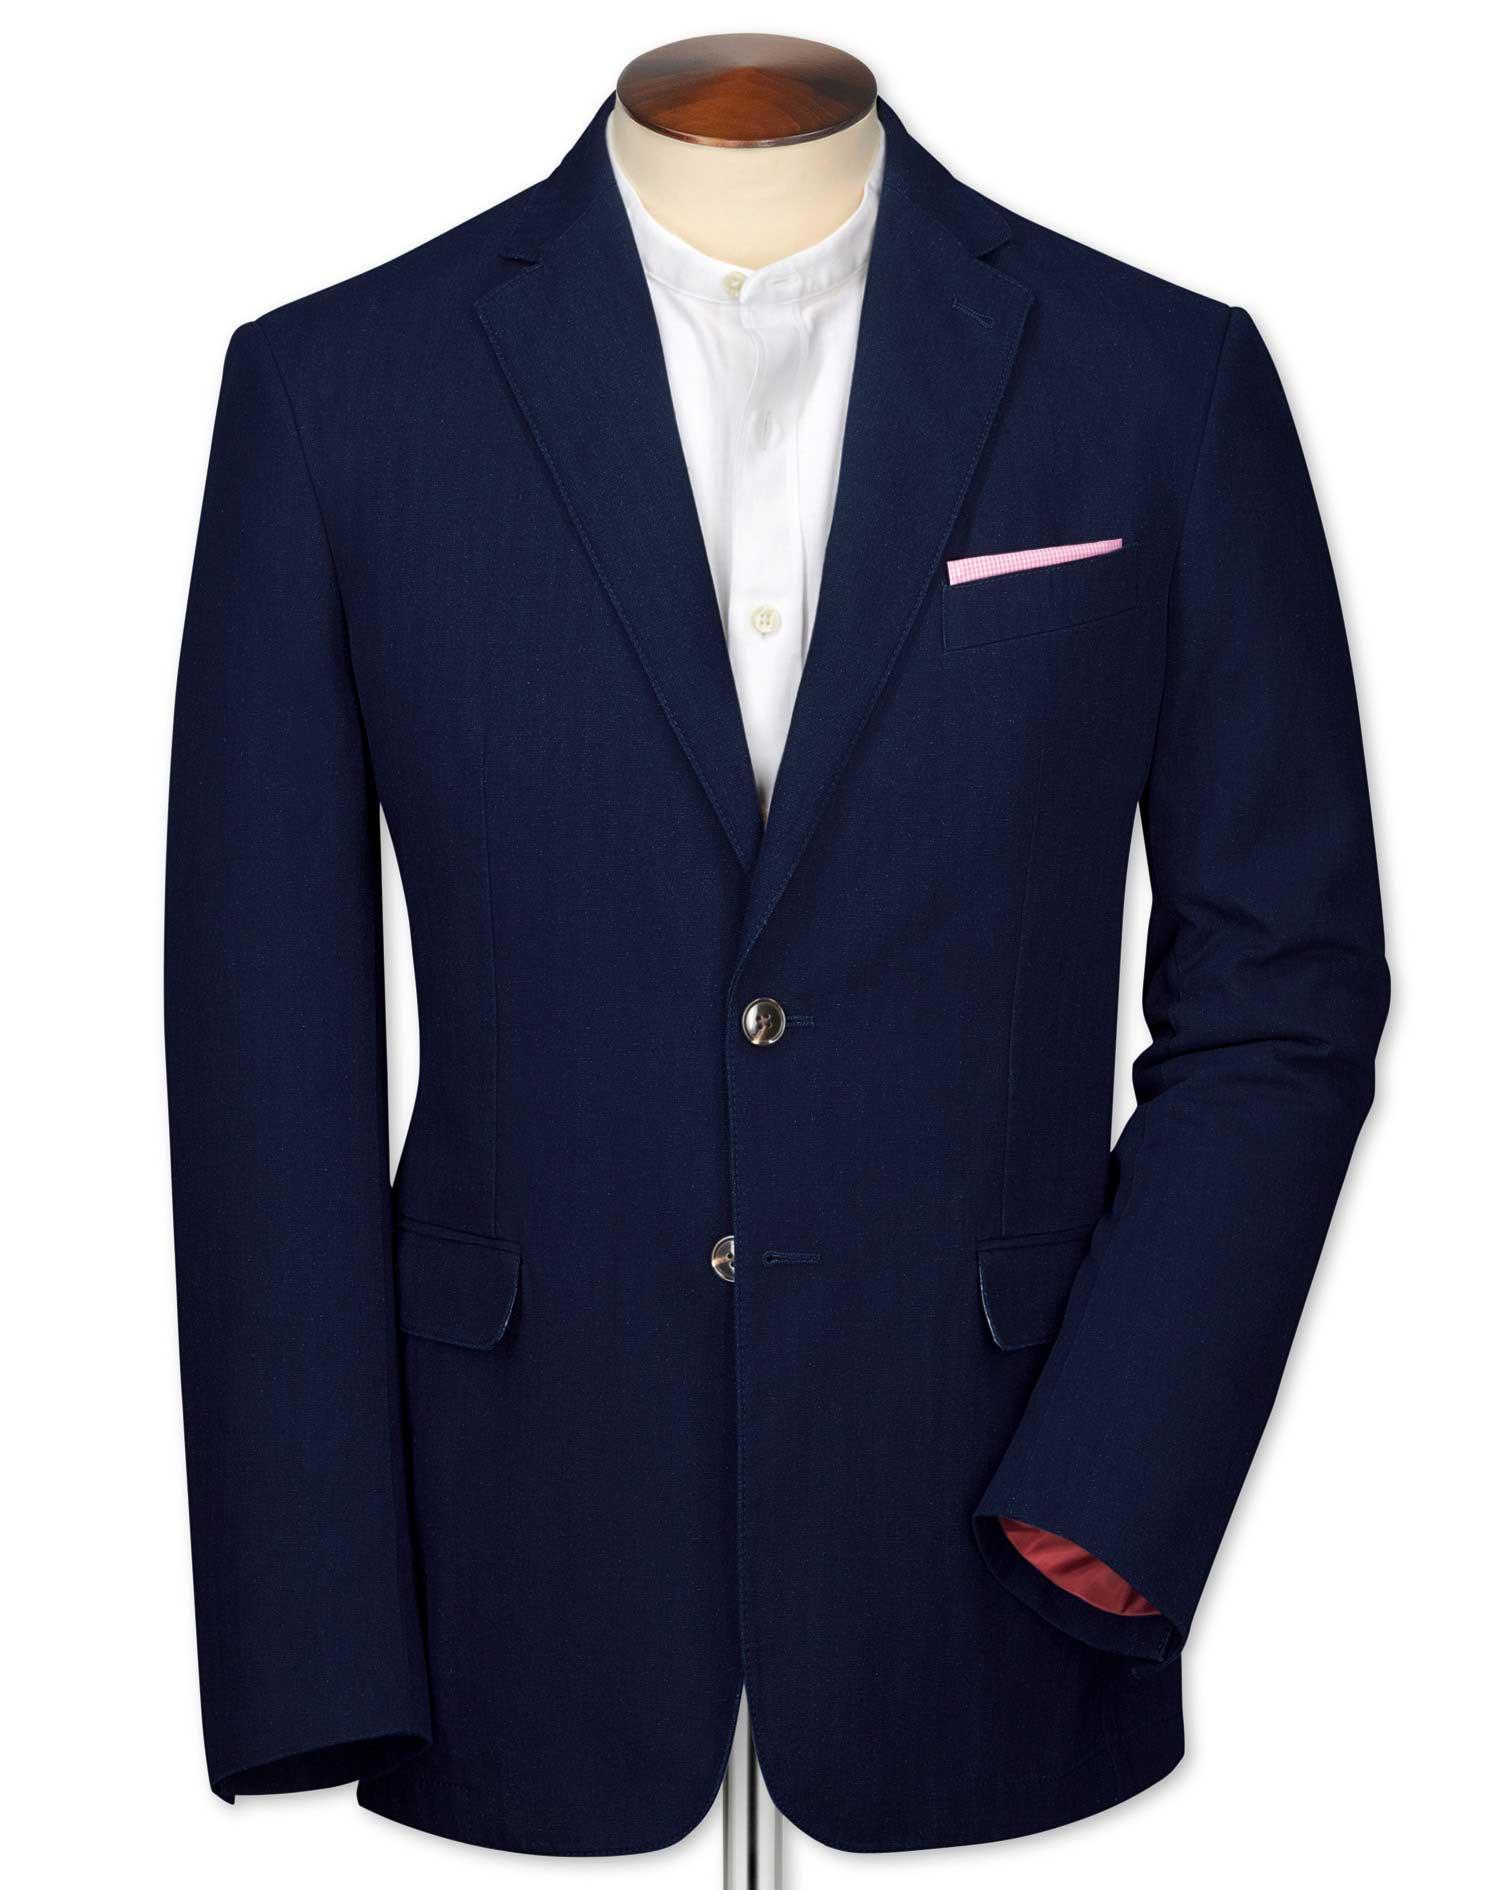 Classic Fit Indigo Herringbone Cotton Jacket Size 44 Regular by Charles Tyrwhitt